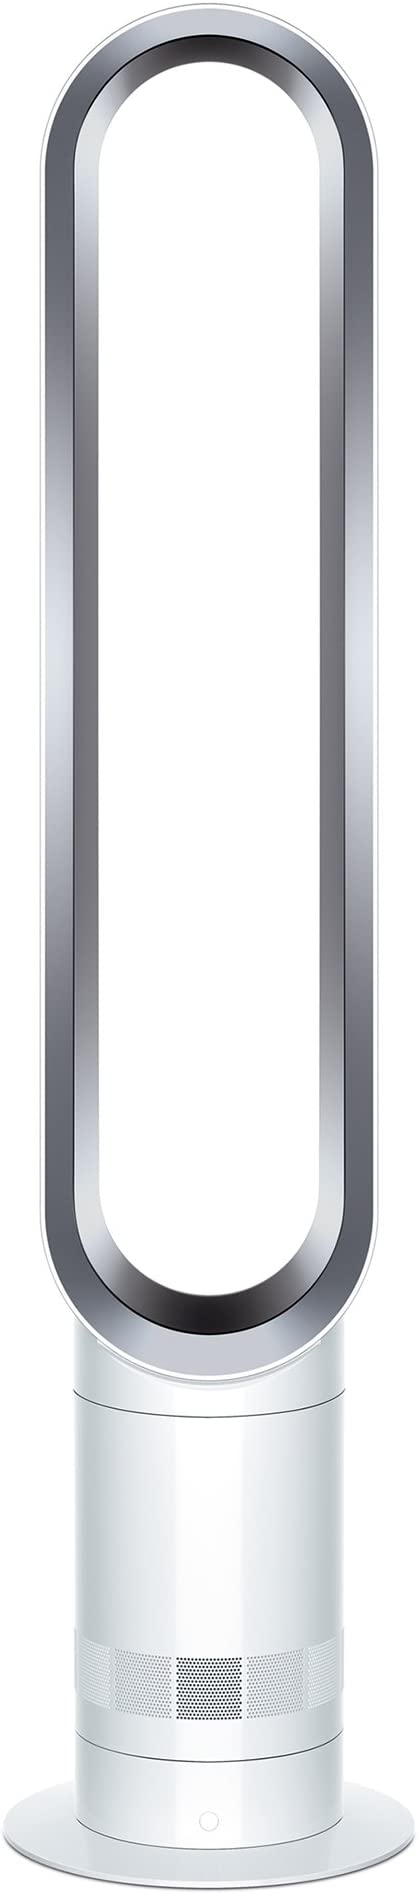 Dyson Cool AM07 Air Multiplier Tower Fan, White/Silver